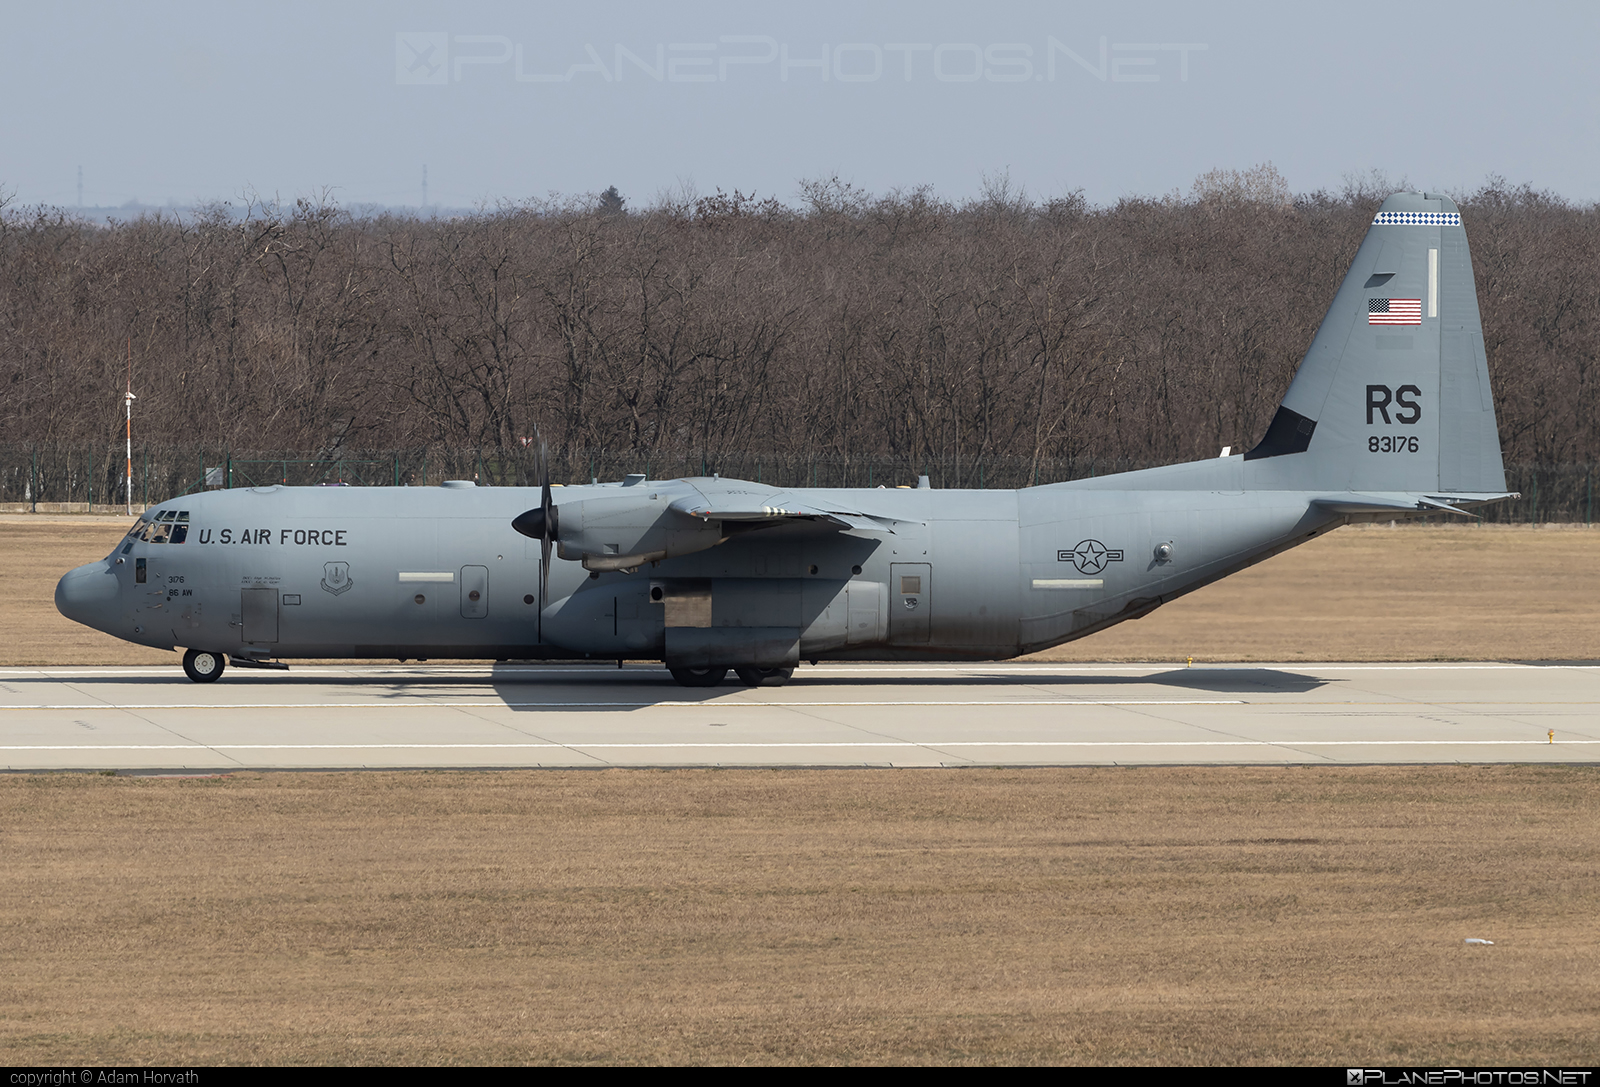 Lockheed Martin C-130J Super Hercules - 08-3176 operated by US Air Force (USAF) #LockheedMartin #c130 #c130j #superhercules #usaf #usairforce